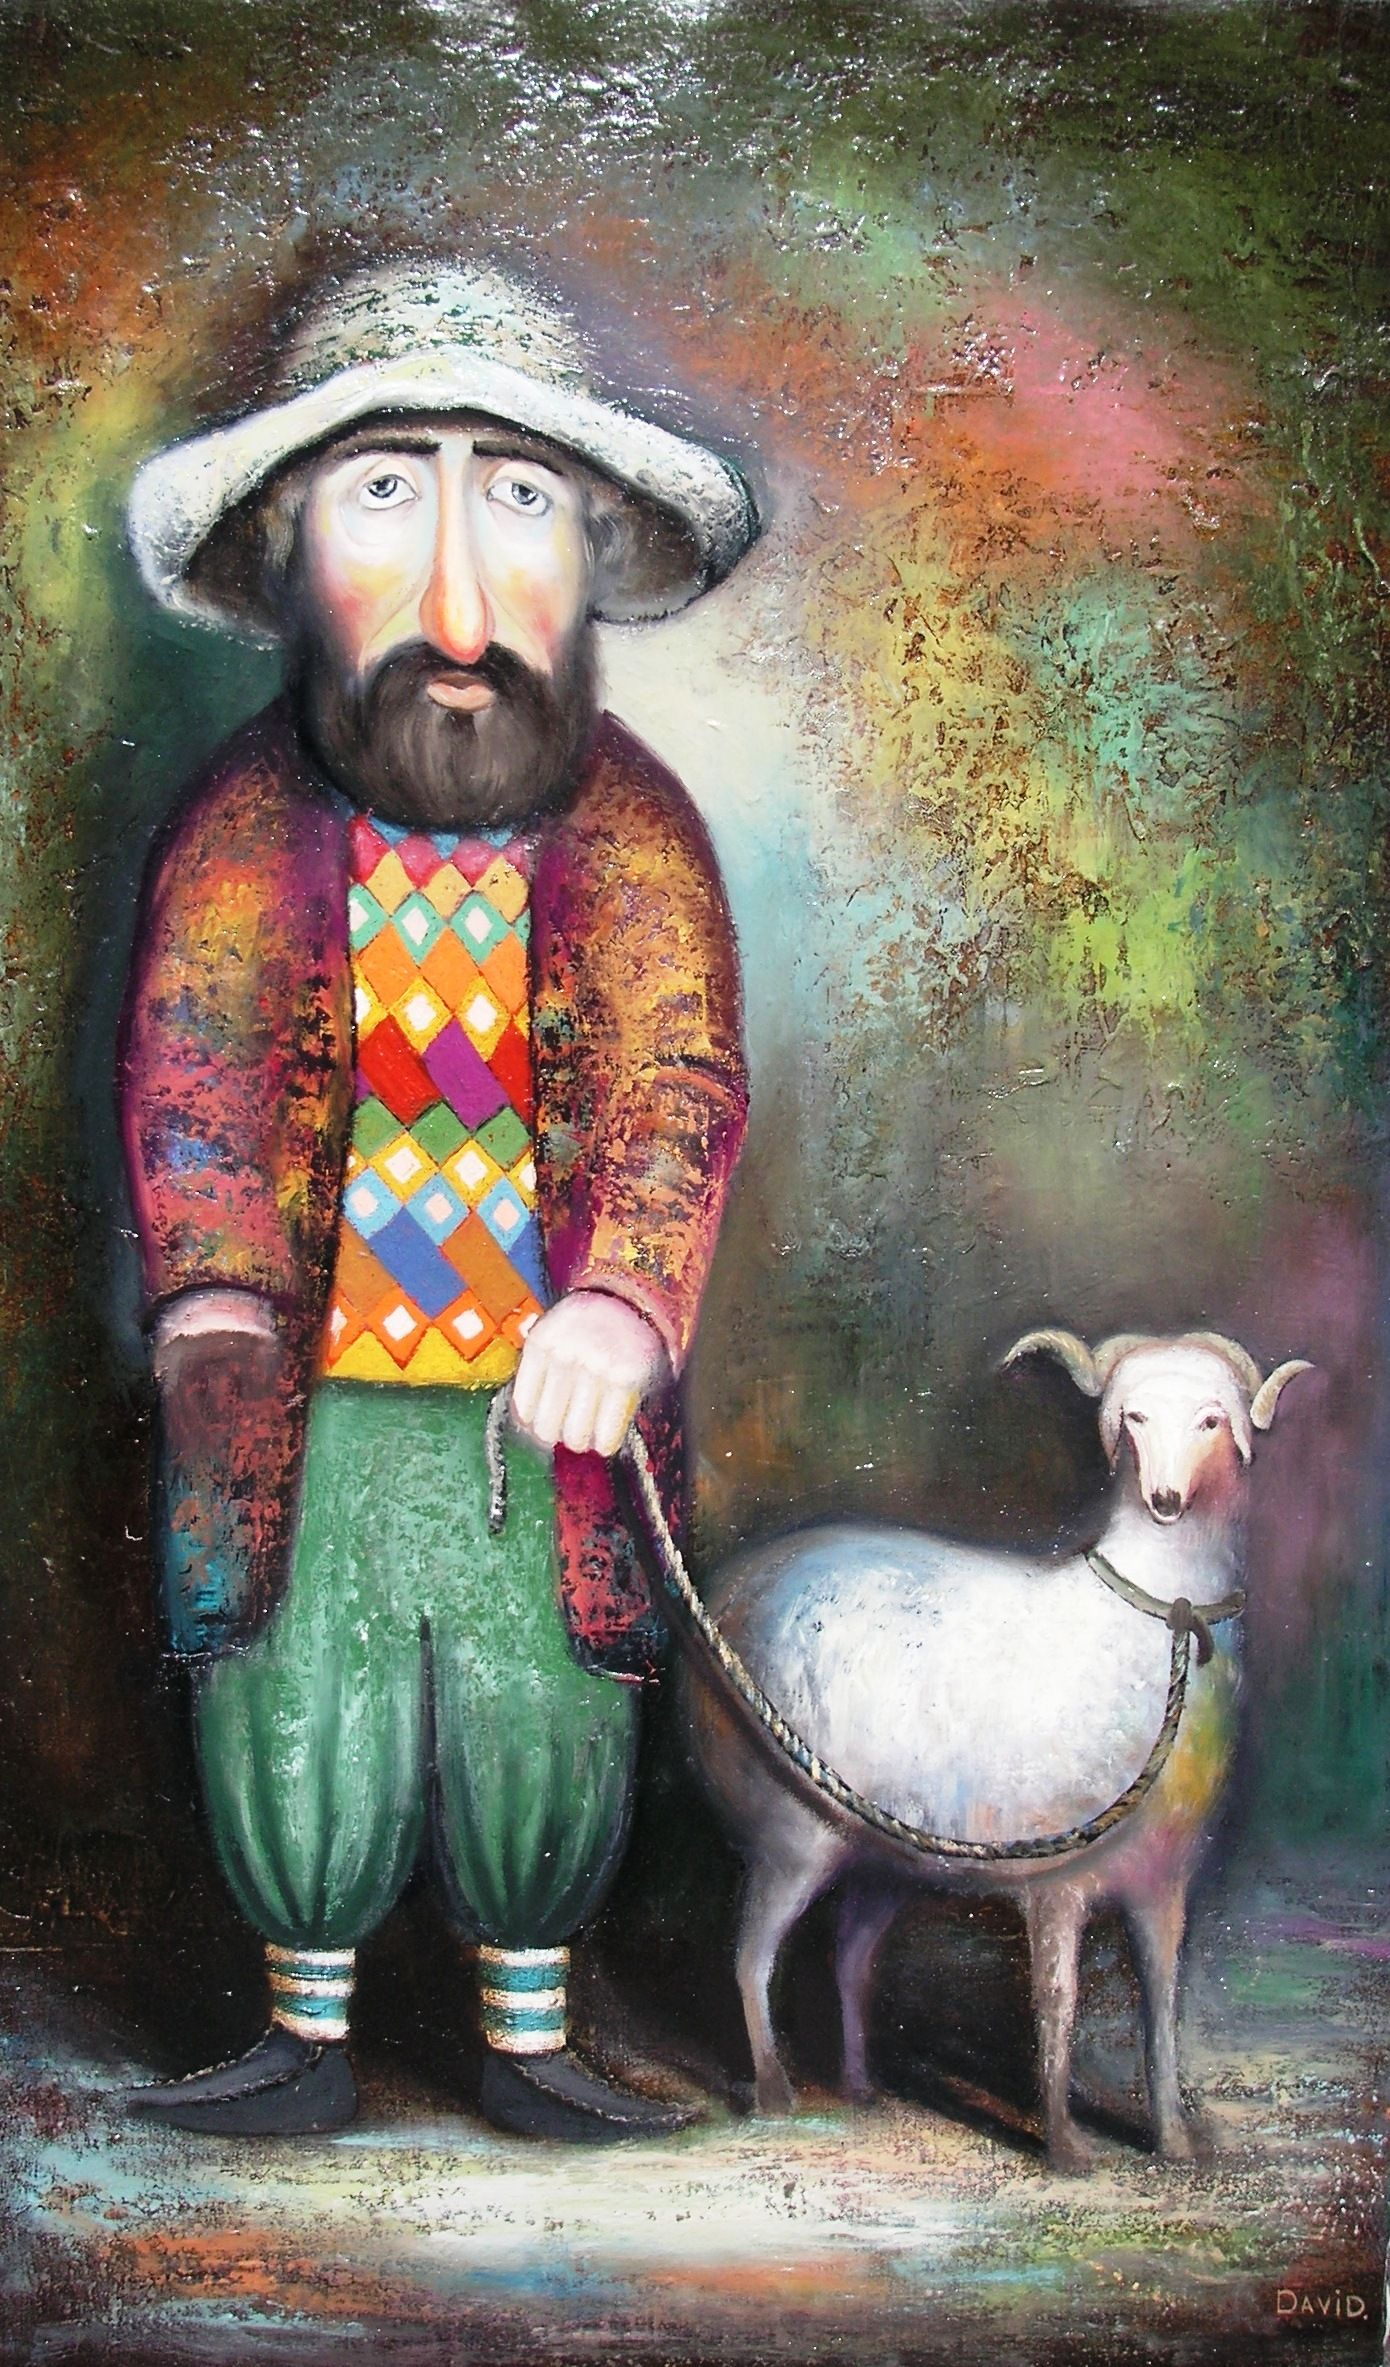 Baranovets by David Martiashvili - man and goat